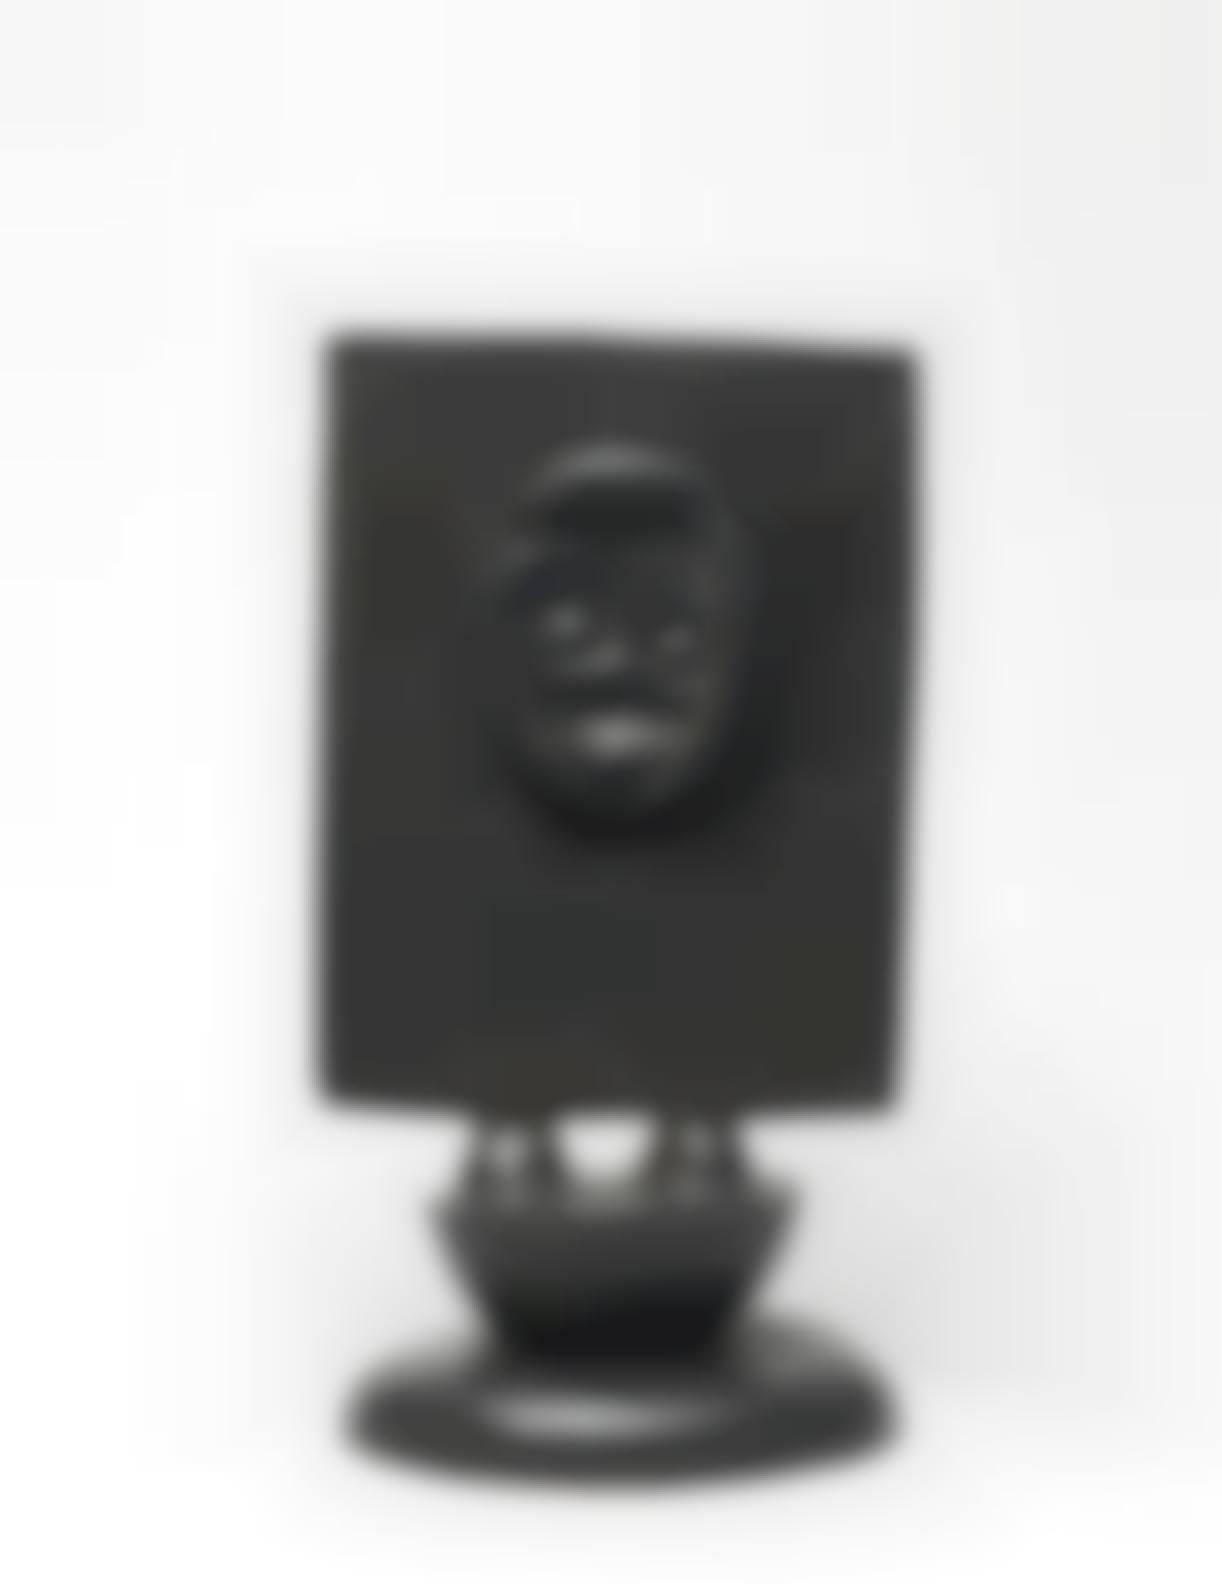 Max Ernst-Cheri Bibi-1973